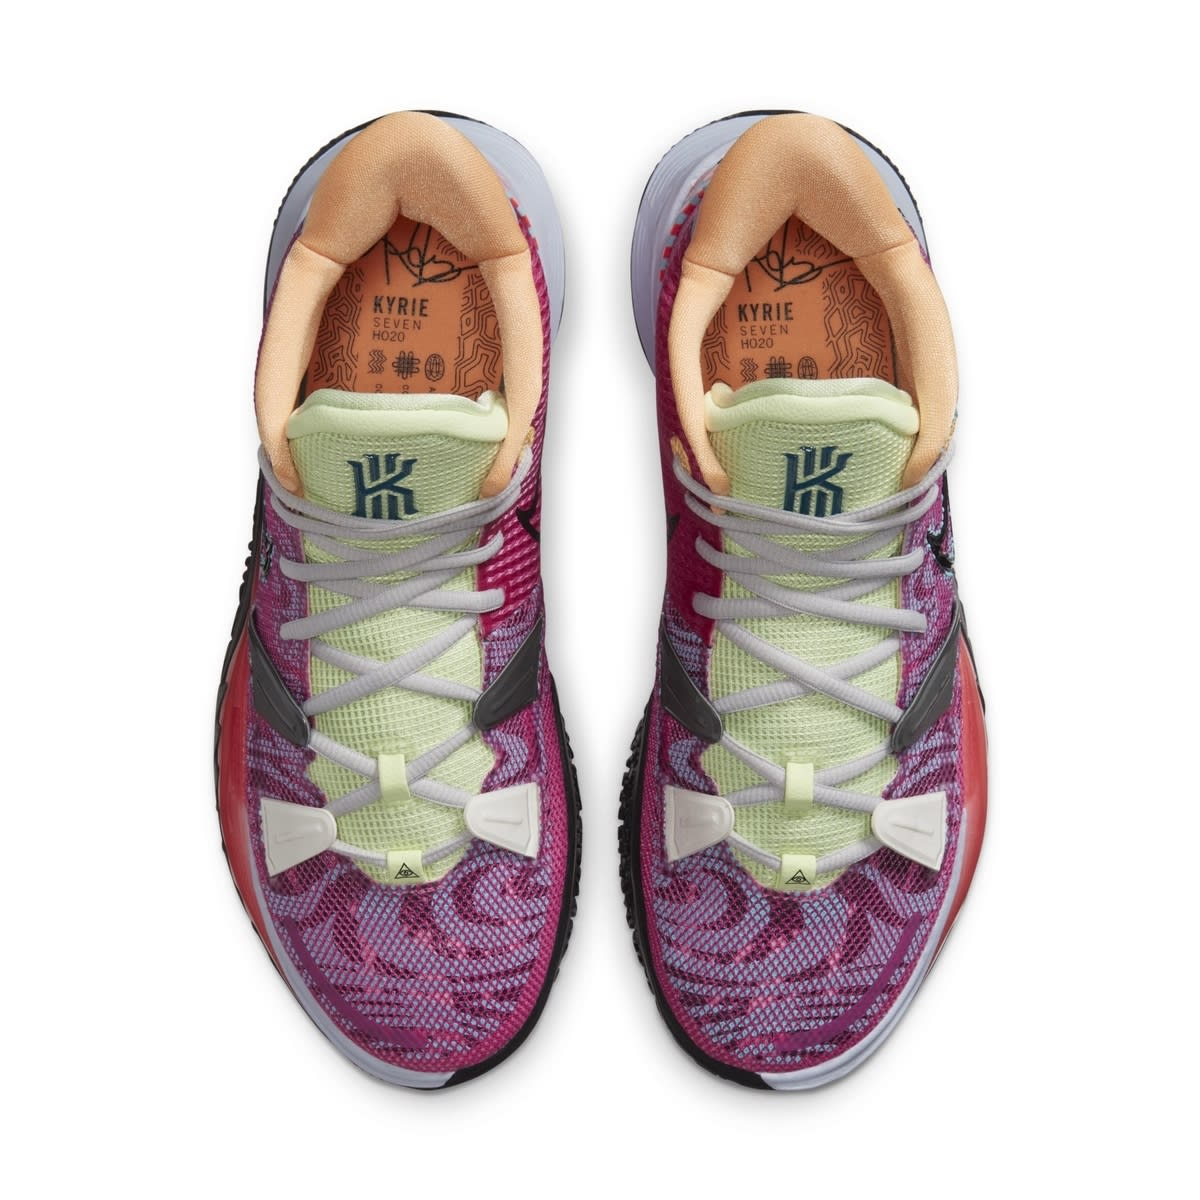 Nike Kyrie 7 Active Fuchsia/Black-Ghost-Multi-Color 'Hendrix' DC0588-601 Top